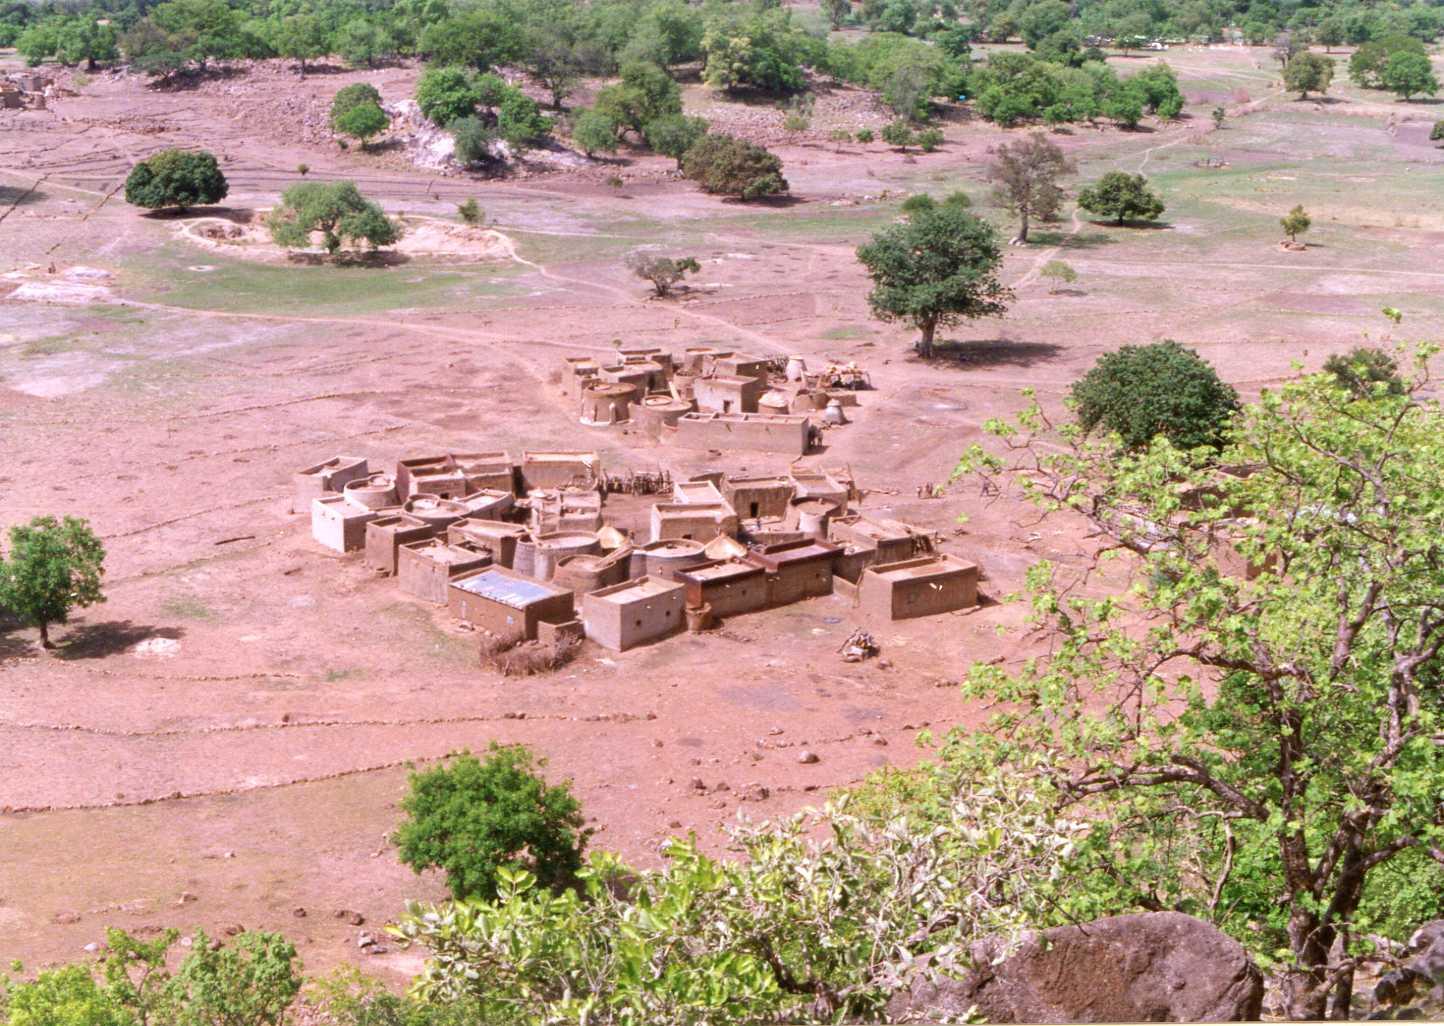 Concession kassena vue d'oiseau. Kassena compound from bird's view.